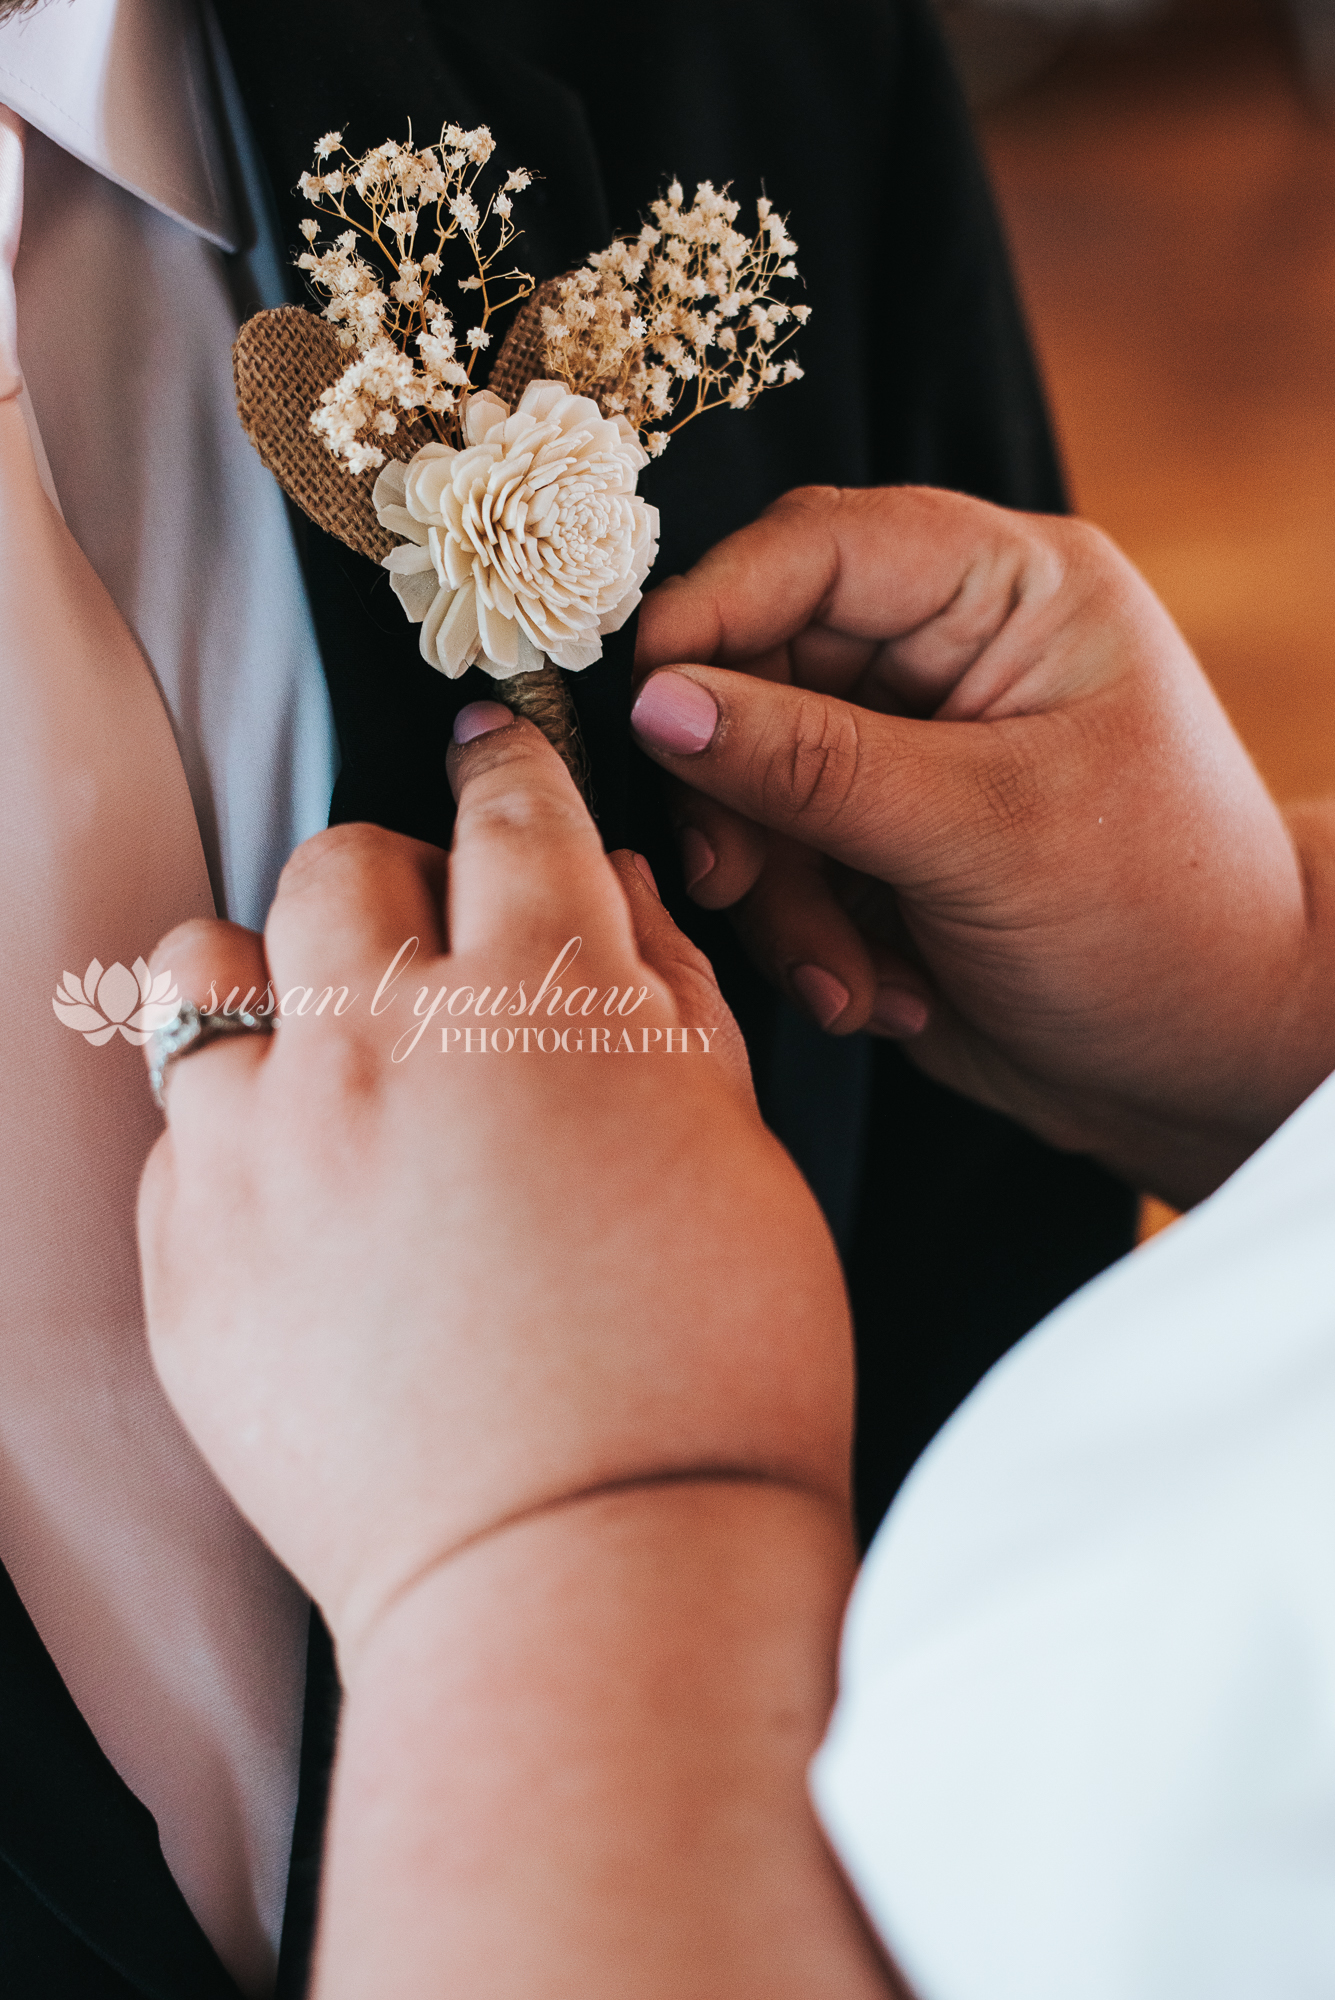 Bill and Sarah Wedding Photos 06-08-2019 SLY Photography -10.jpg